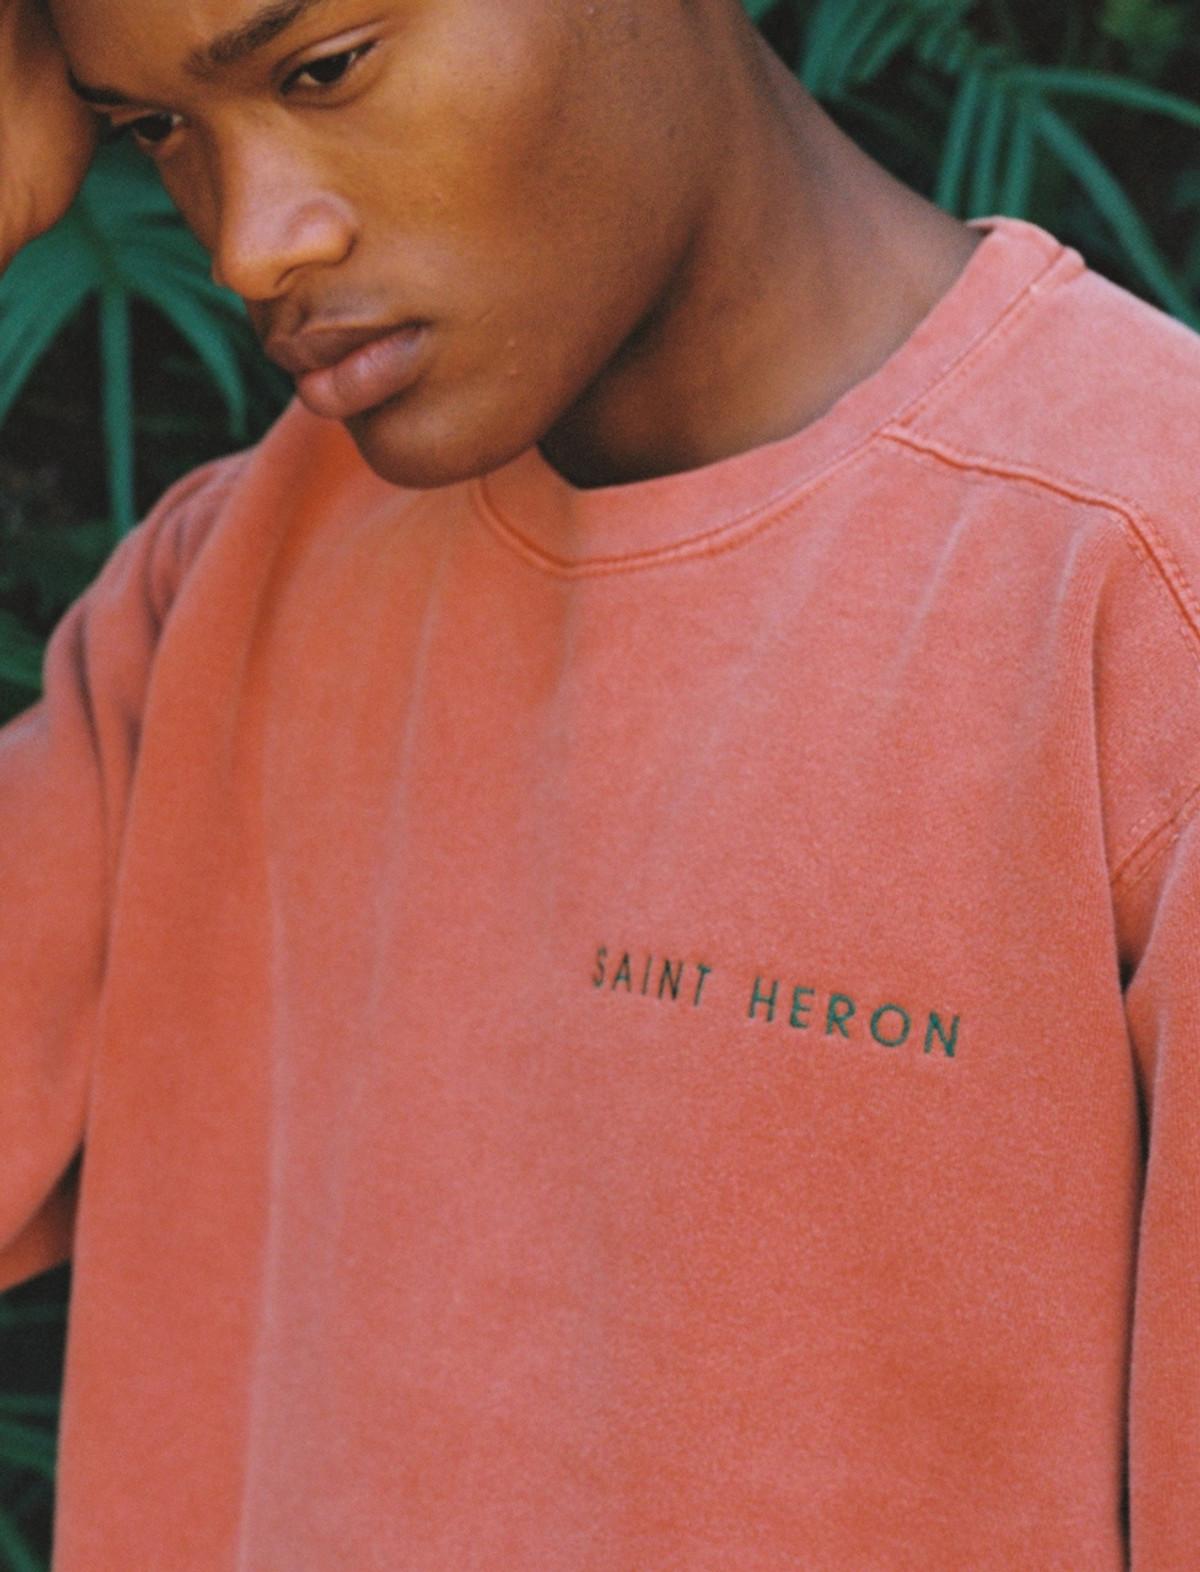 SAINT HERON UNISEX CREWNECK SWEATSHIRT - YAM/EMERALD (SOLD OUT)